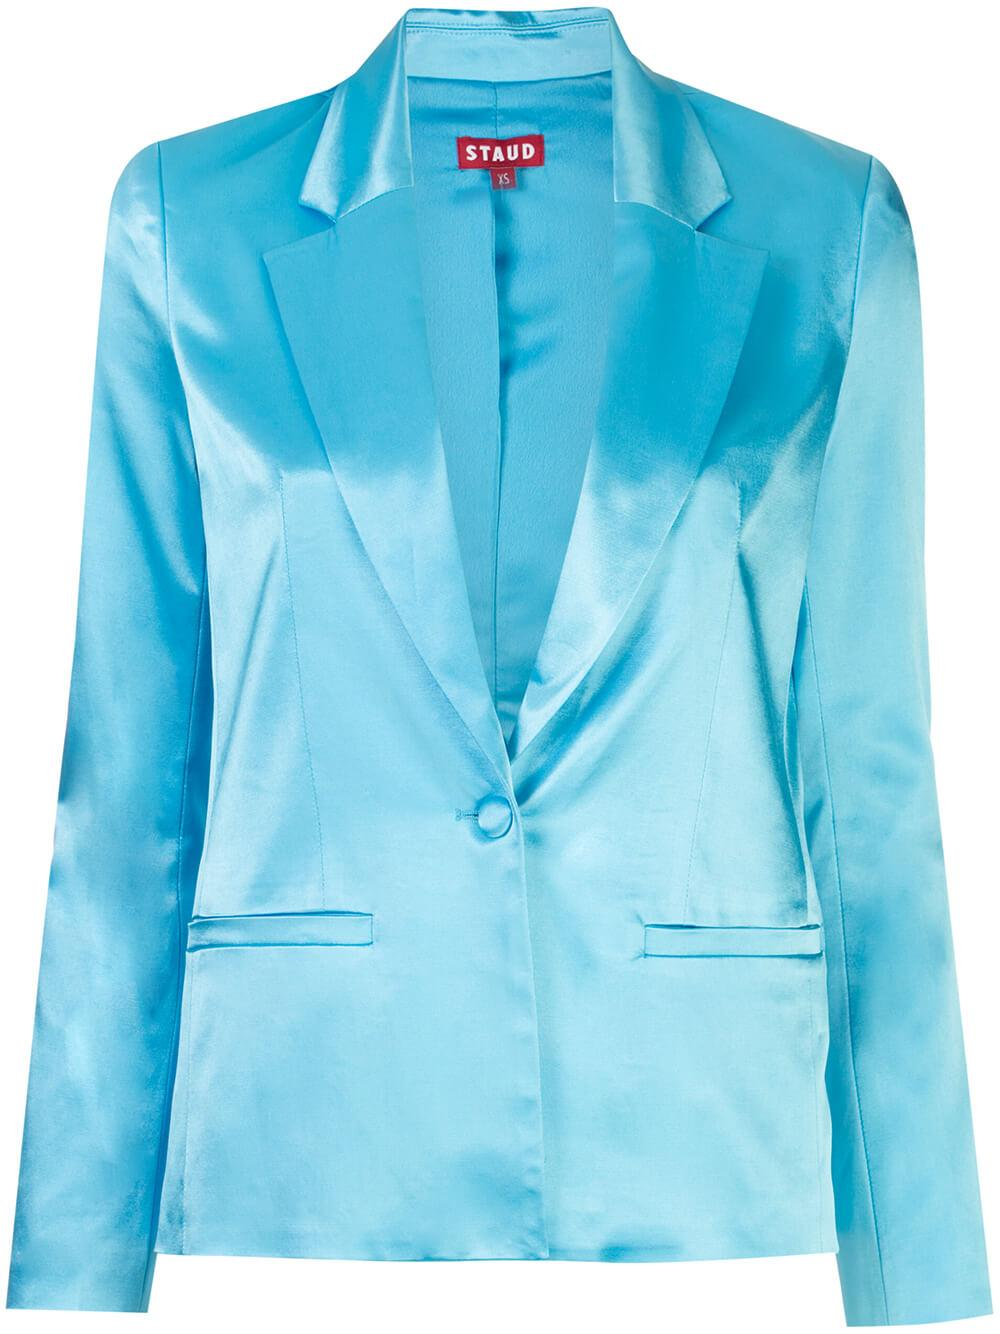 Madden Sateen Single Button Blazer Item # 213-8061-BRBL